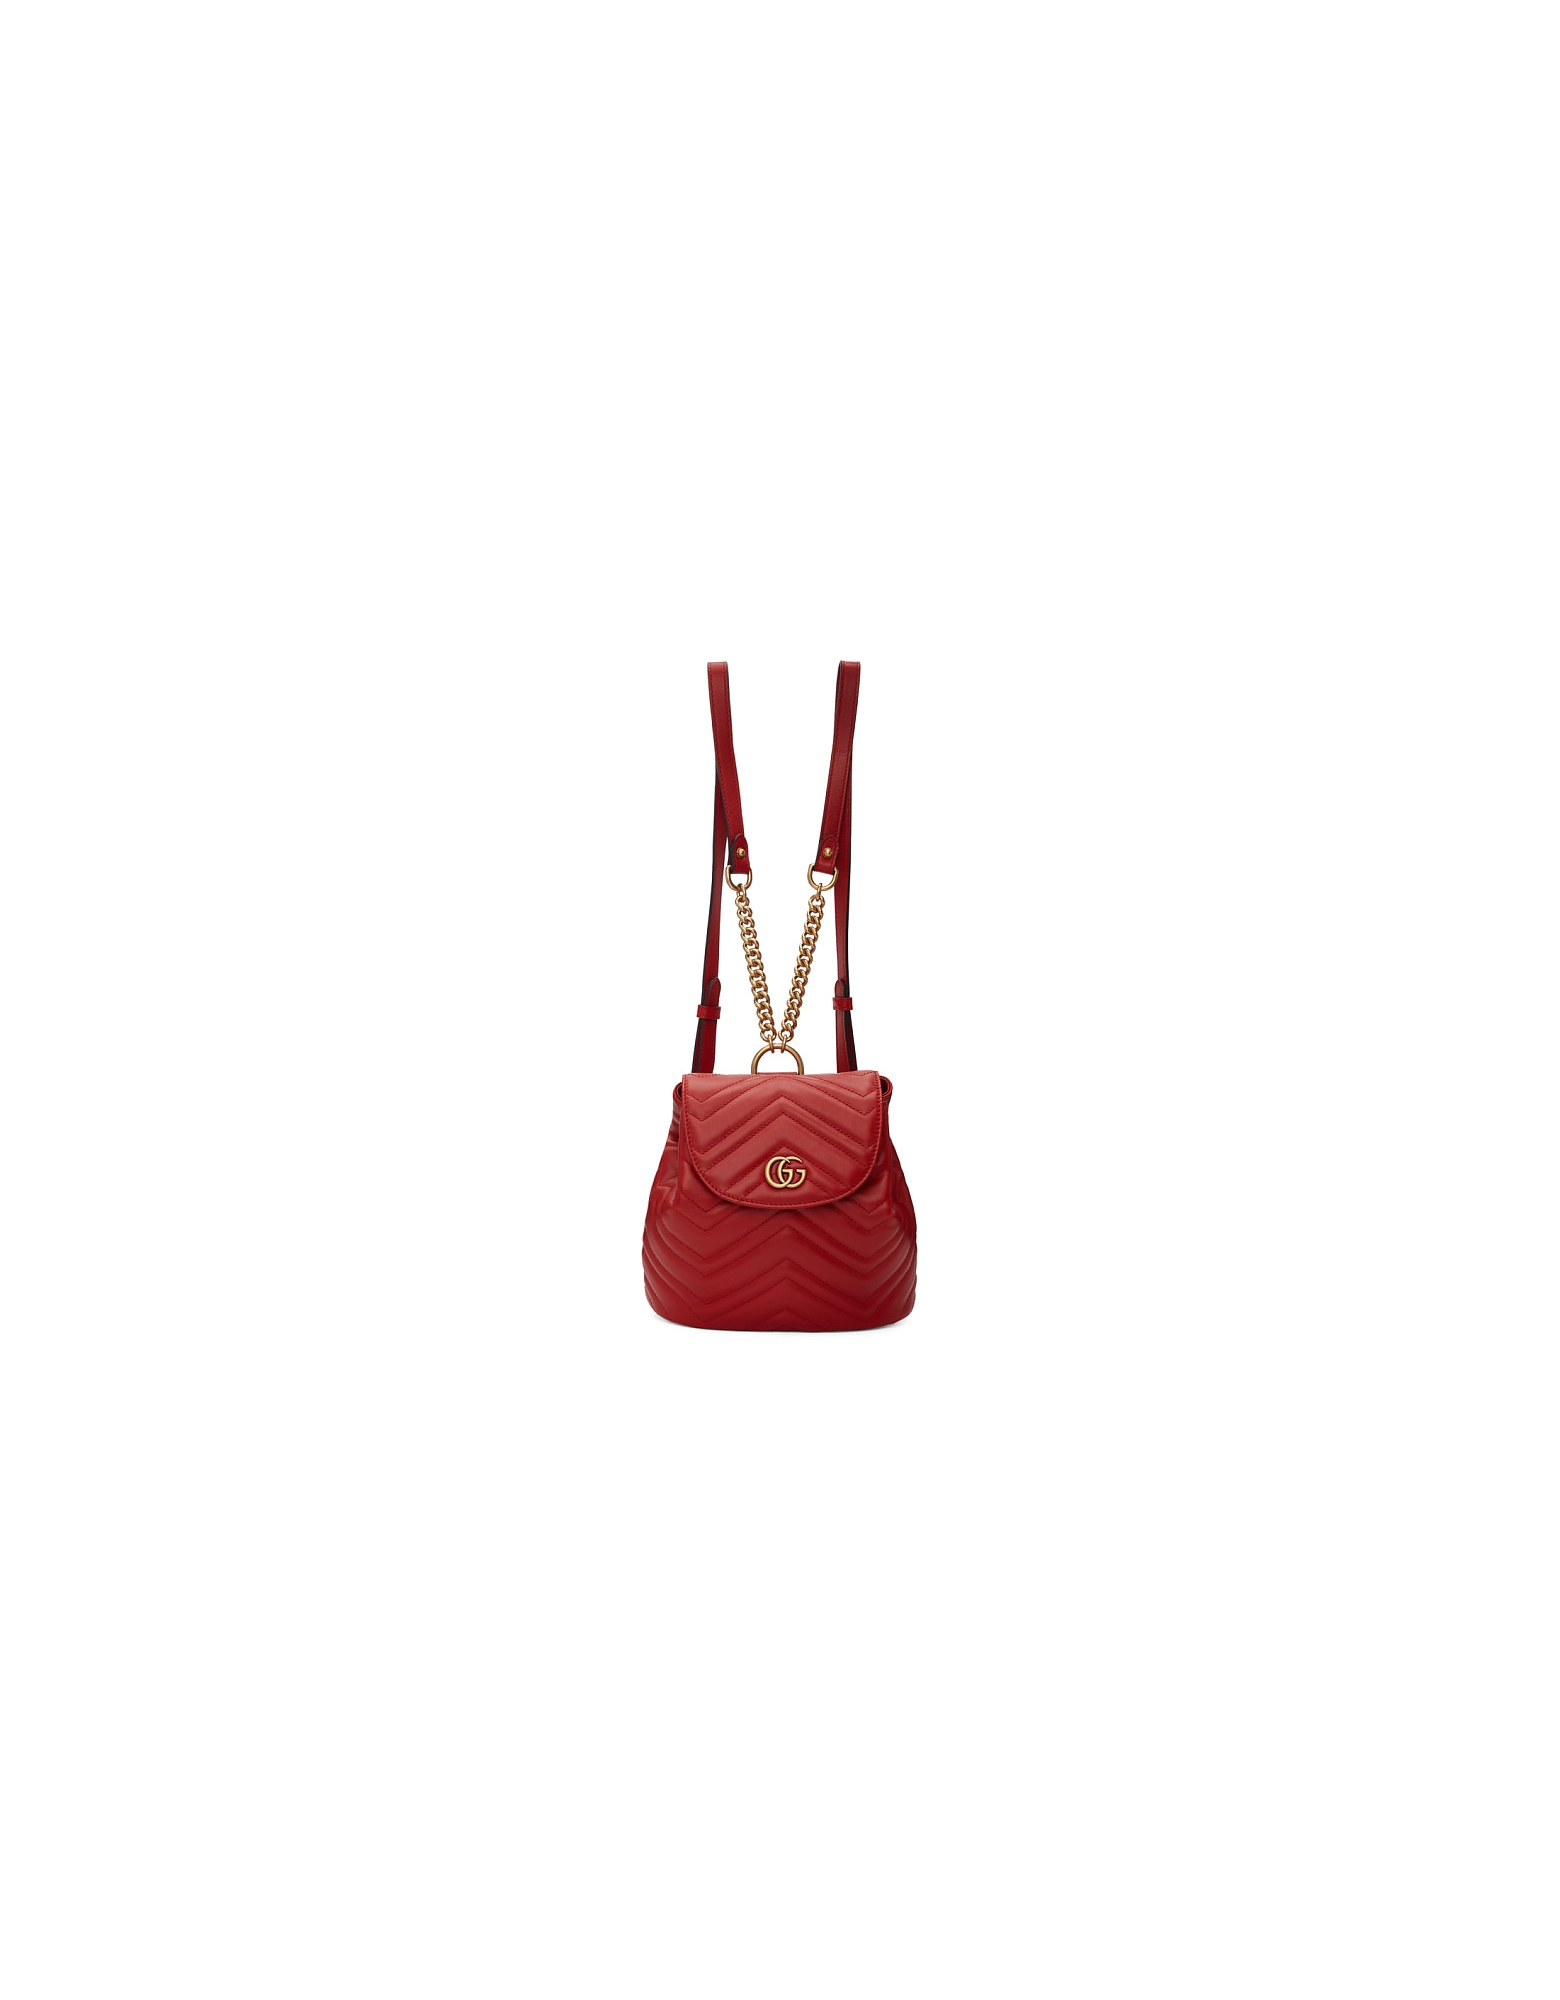 Gucci Designer Handbags, Red Mini GG Marmont 2.0 Backpack